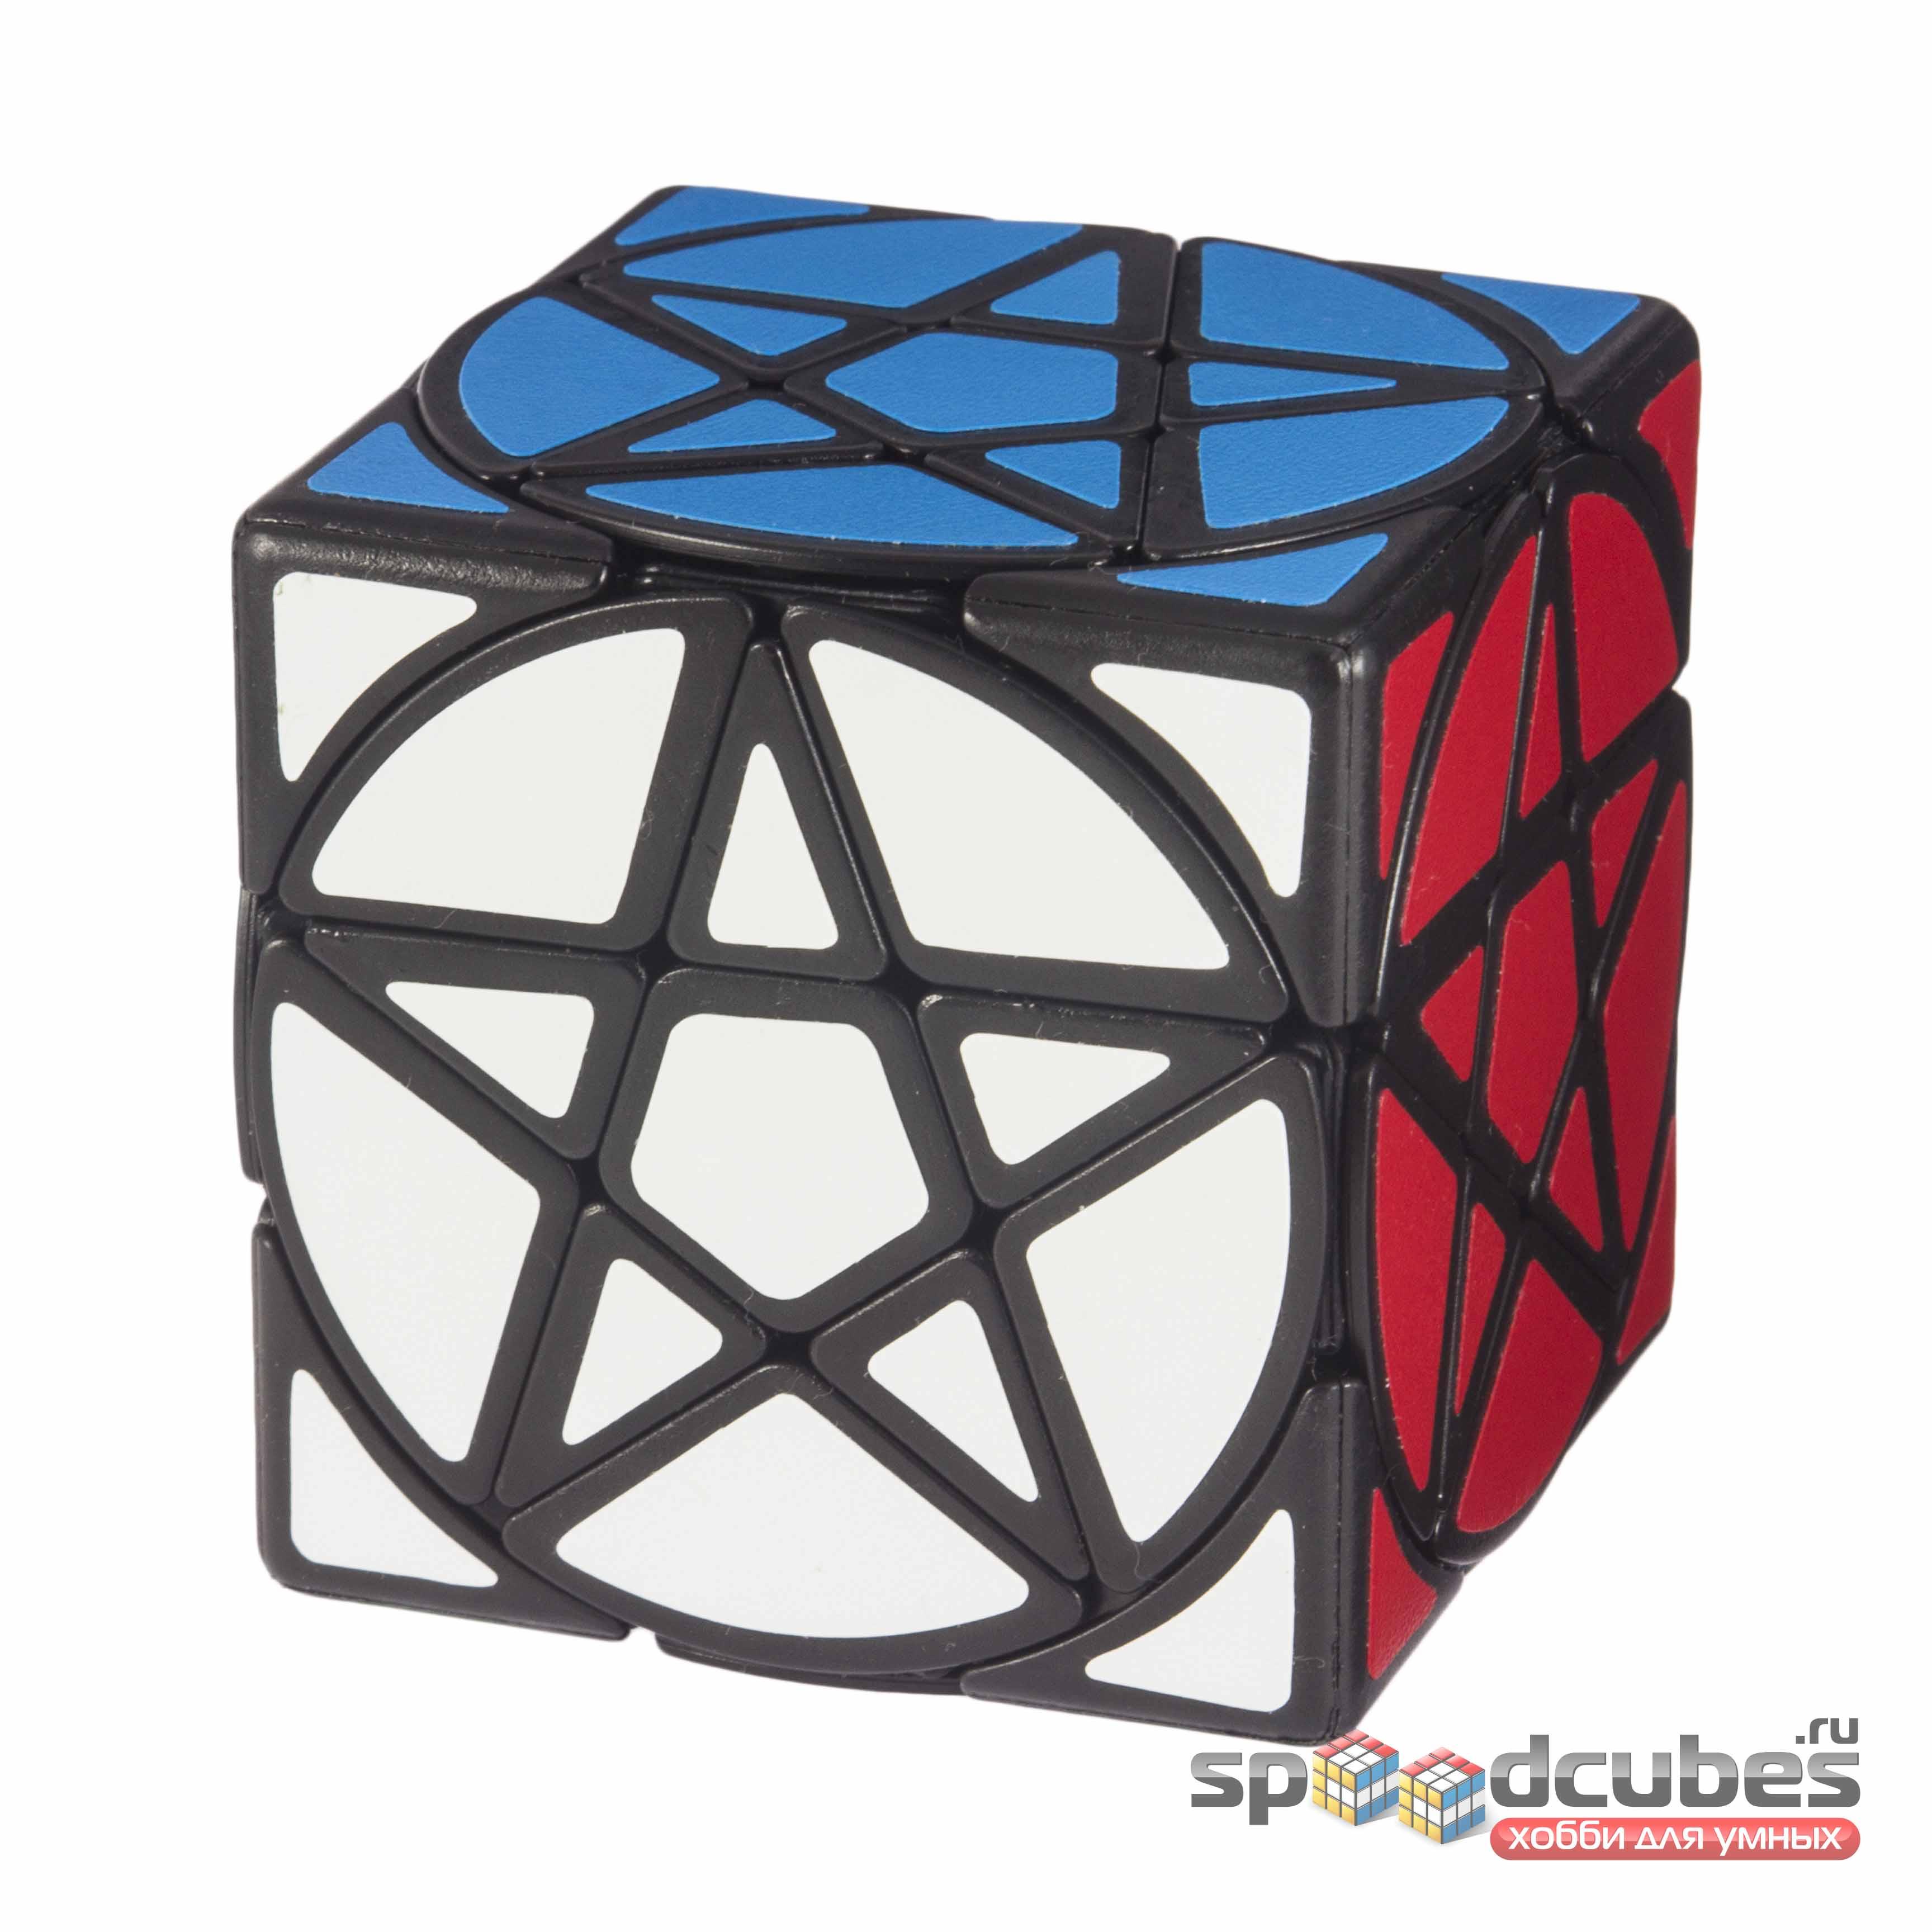 Pentacle Cube Black 1